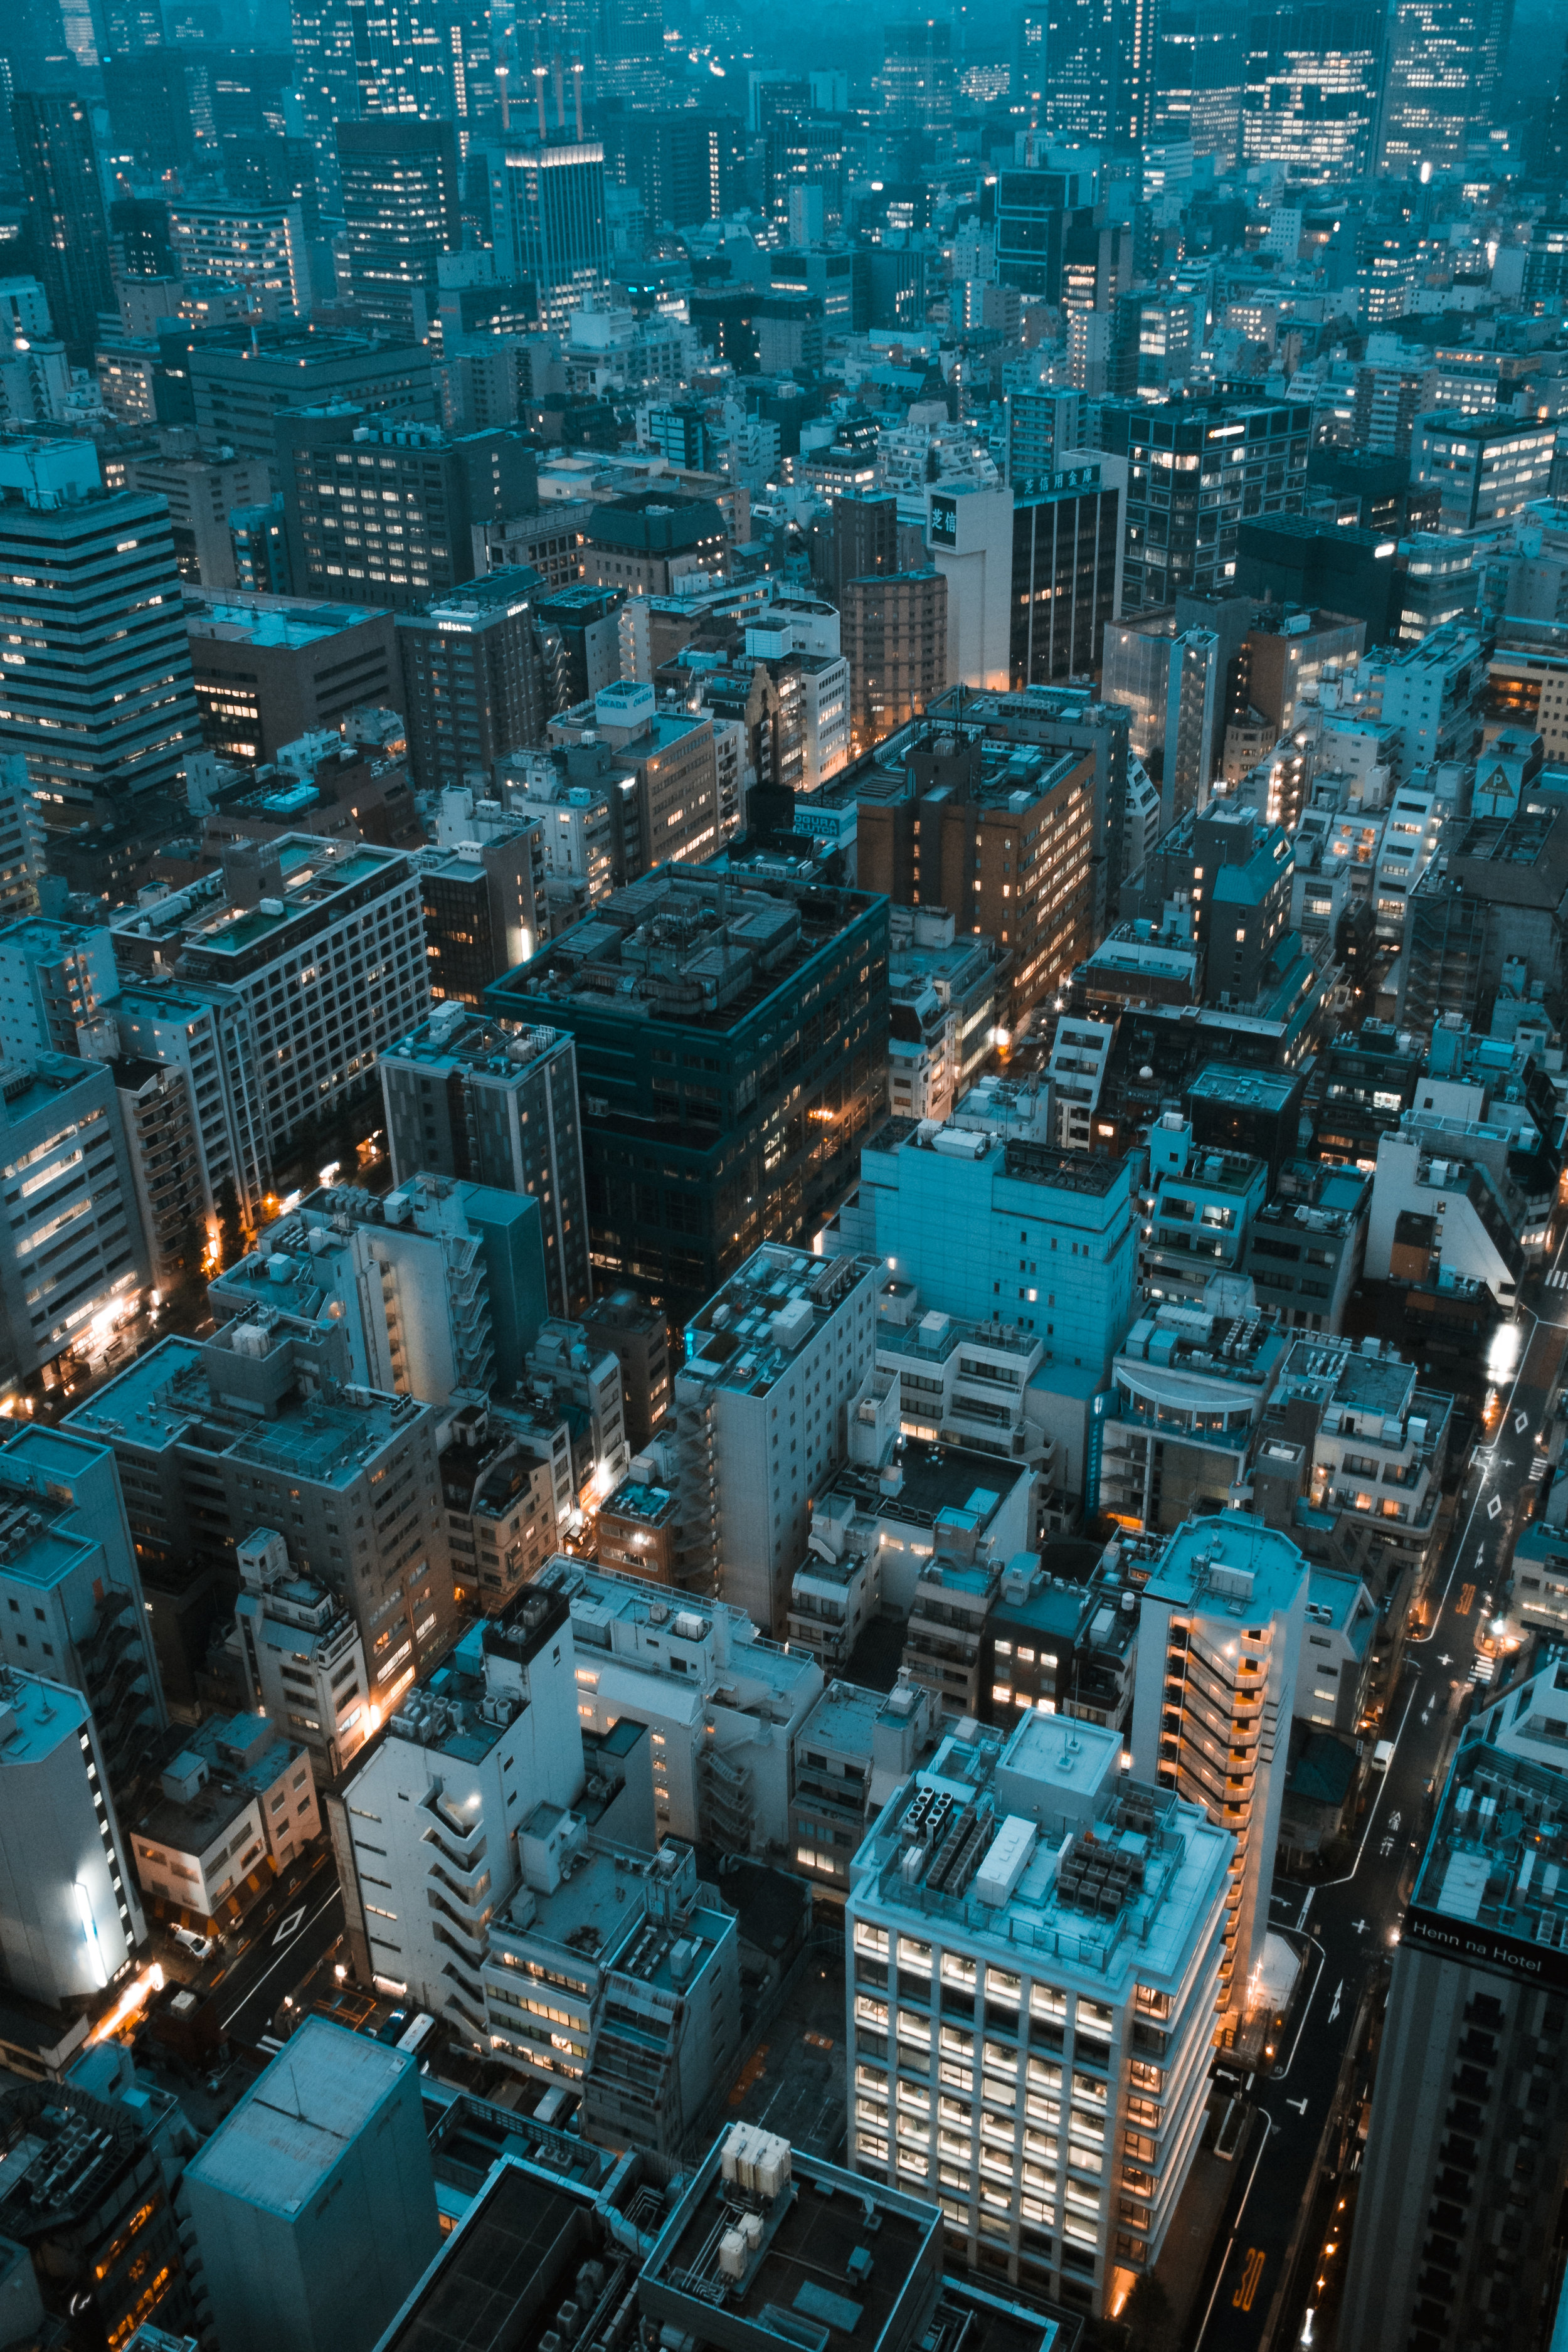 TokyoJapan_2018_AdamDillon_DSCF9647.jpg